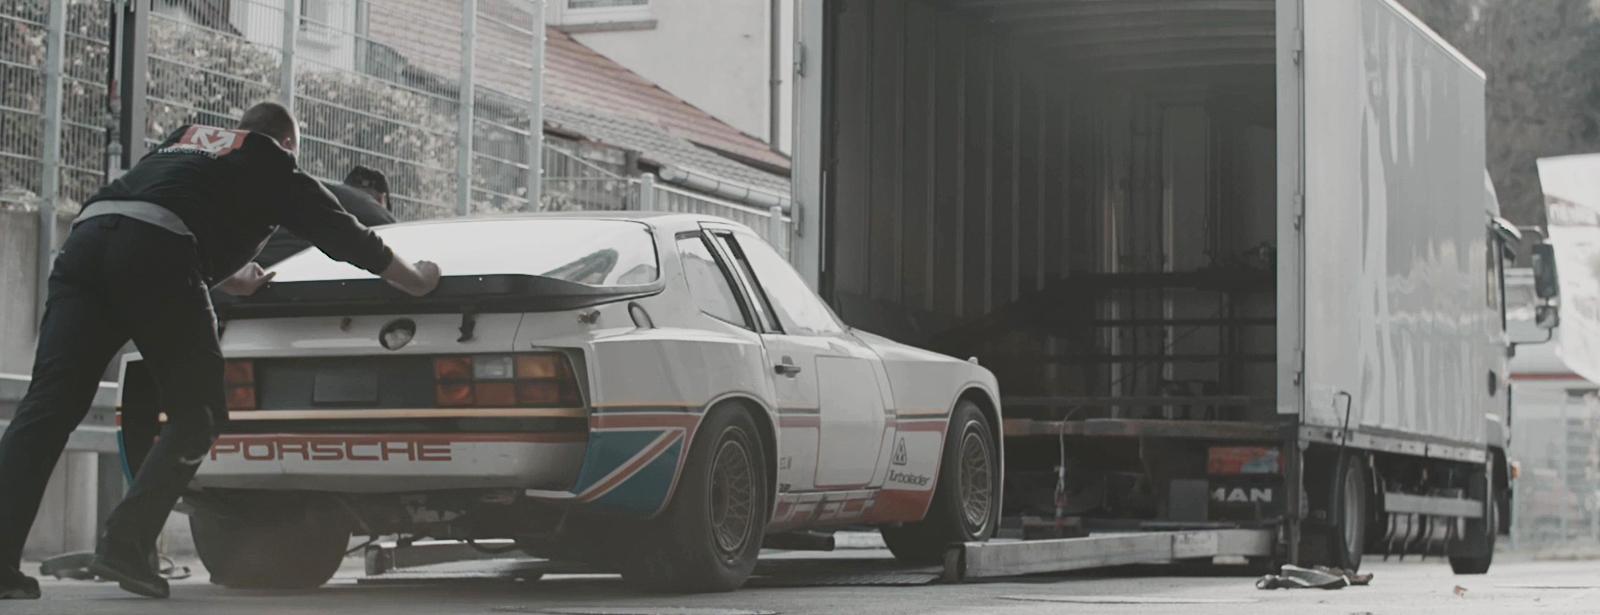 Porsche Cars GB - 924 GTP Restoration